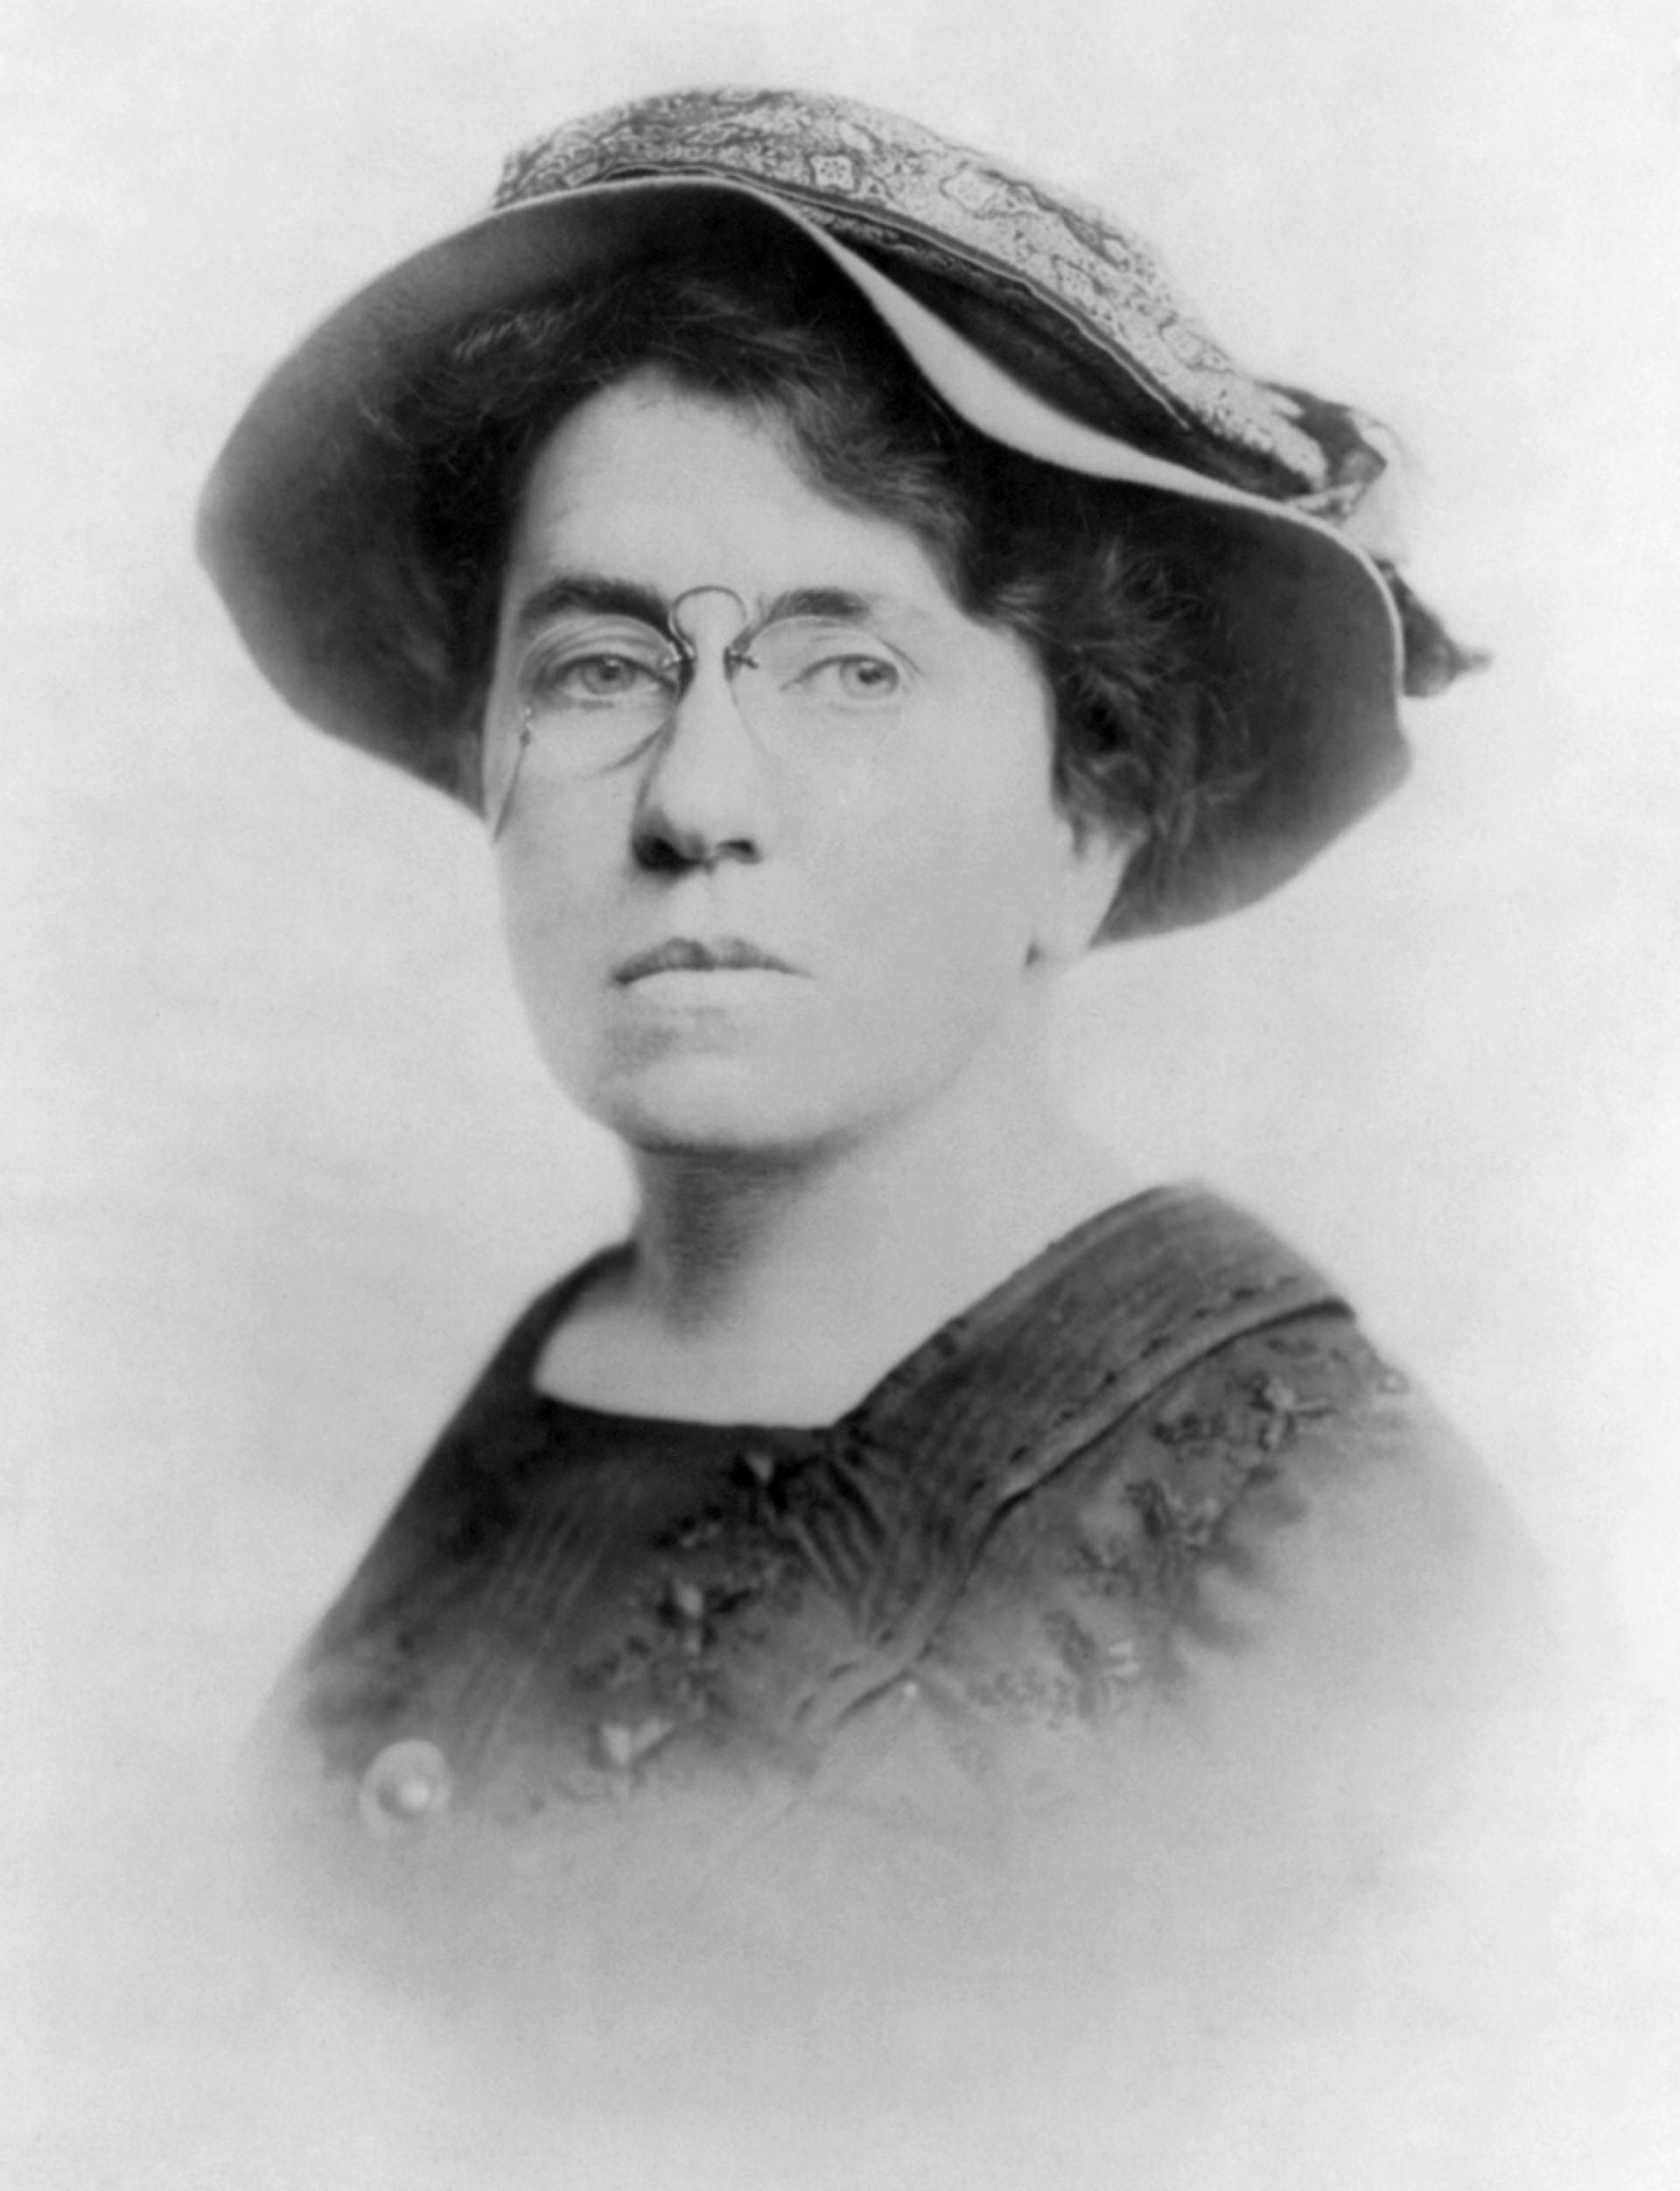 006 Emma Goldman 2 Anarchism And Other Essays Essay Incredible Summary Pdf 1920